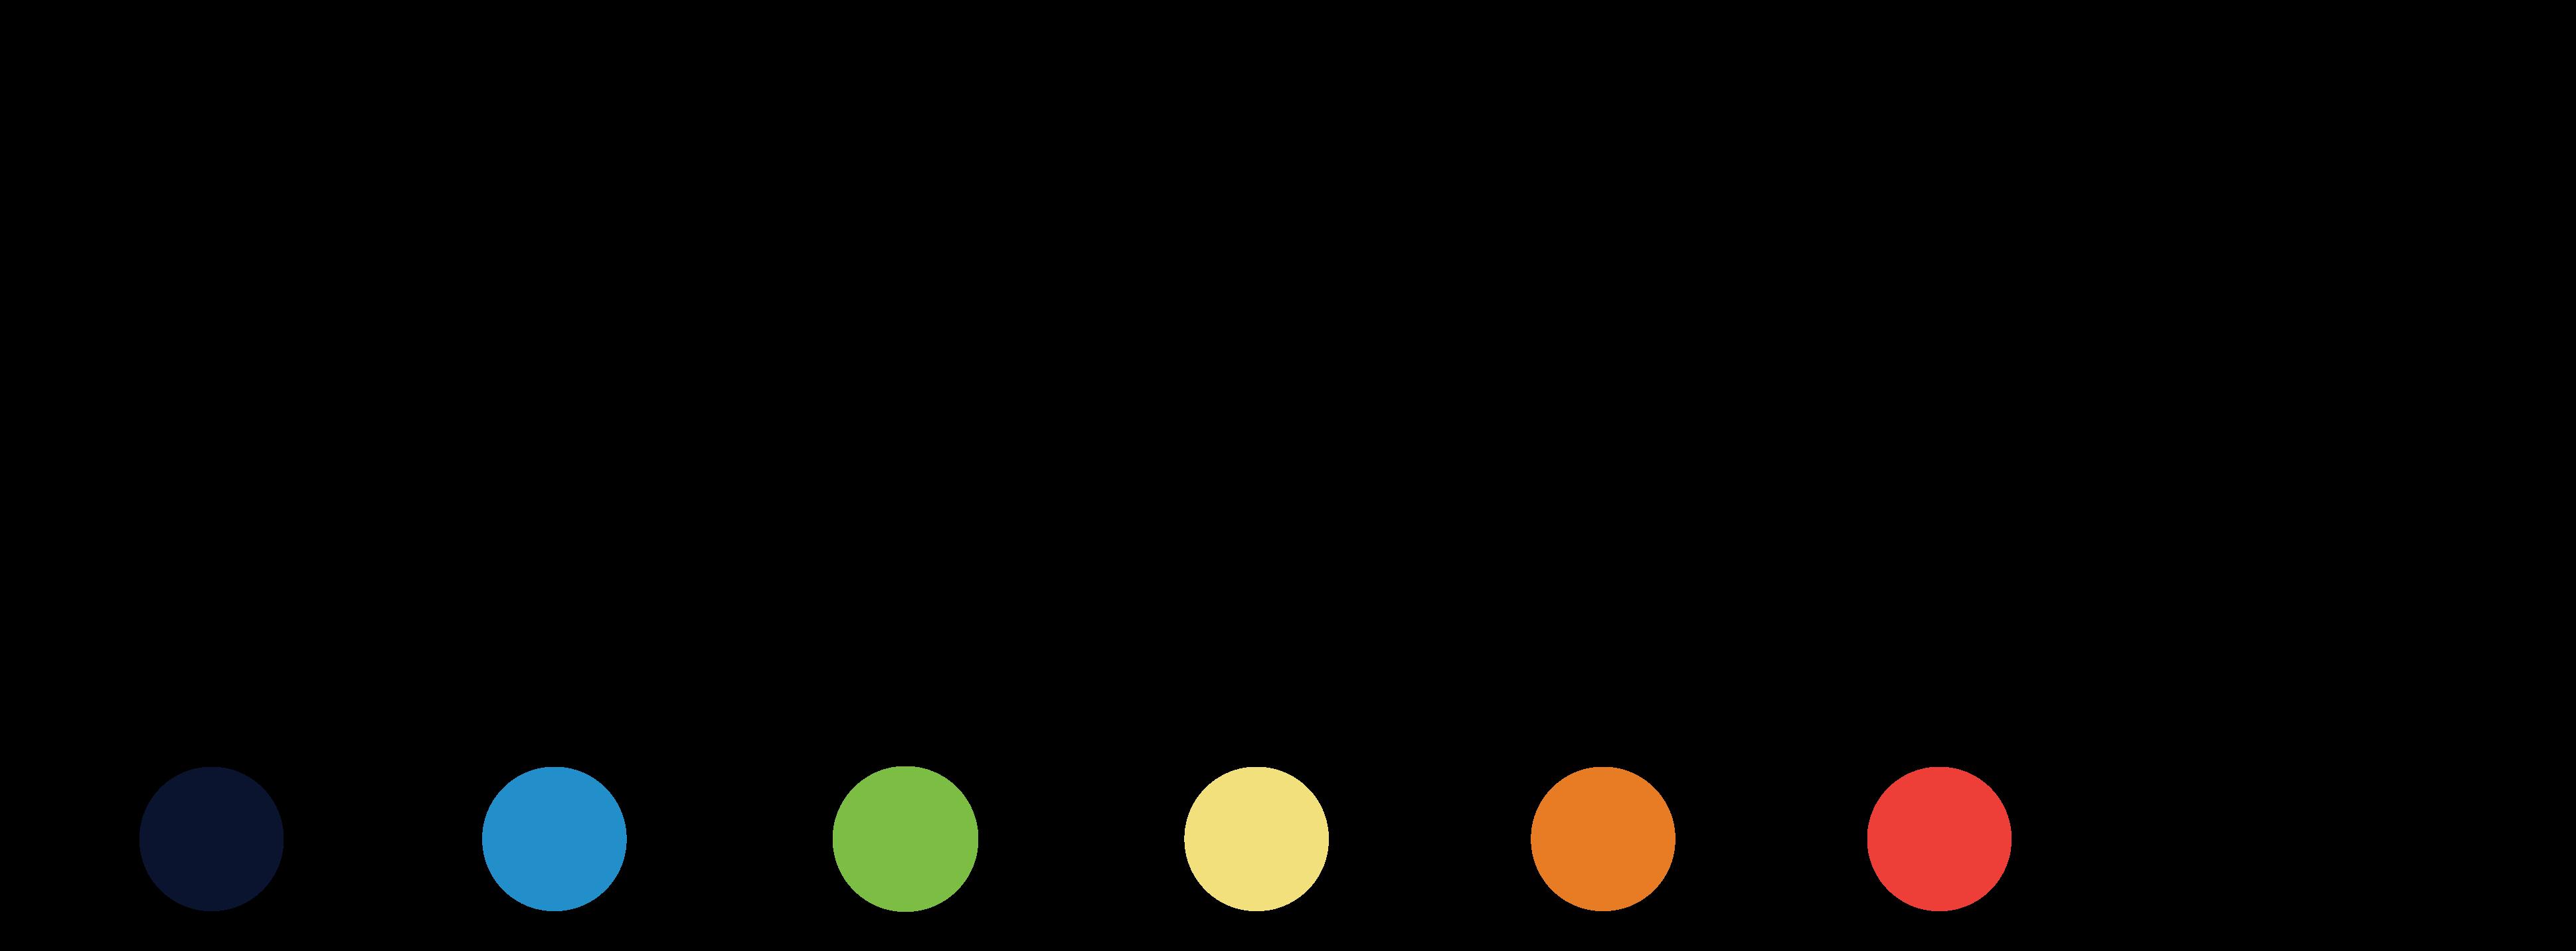 subog's logo